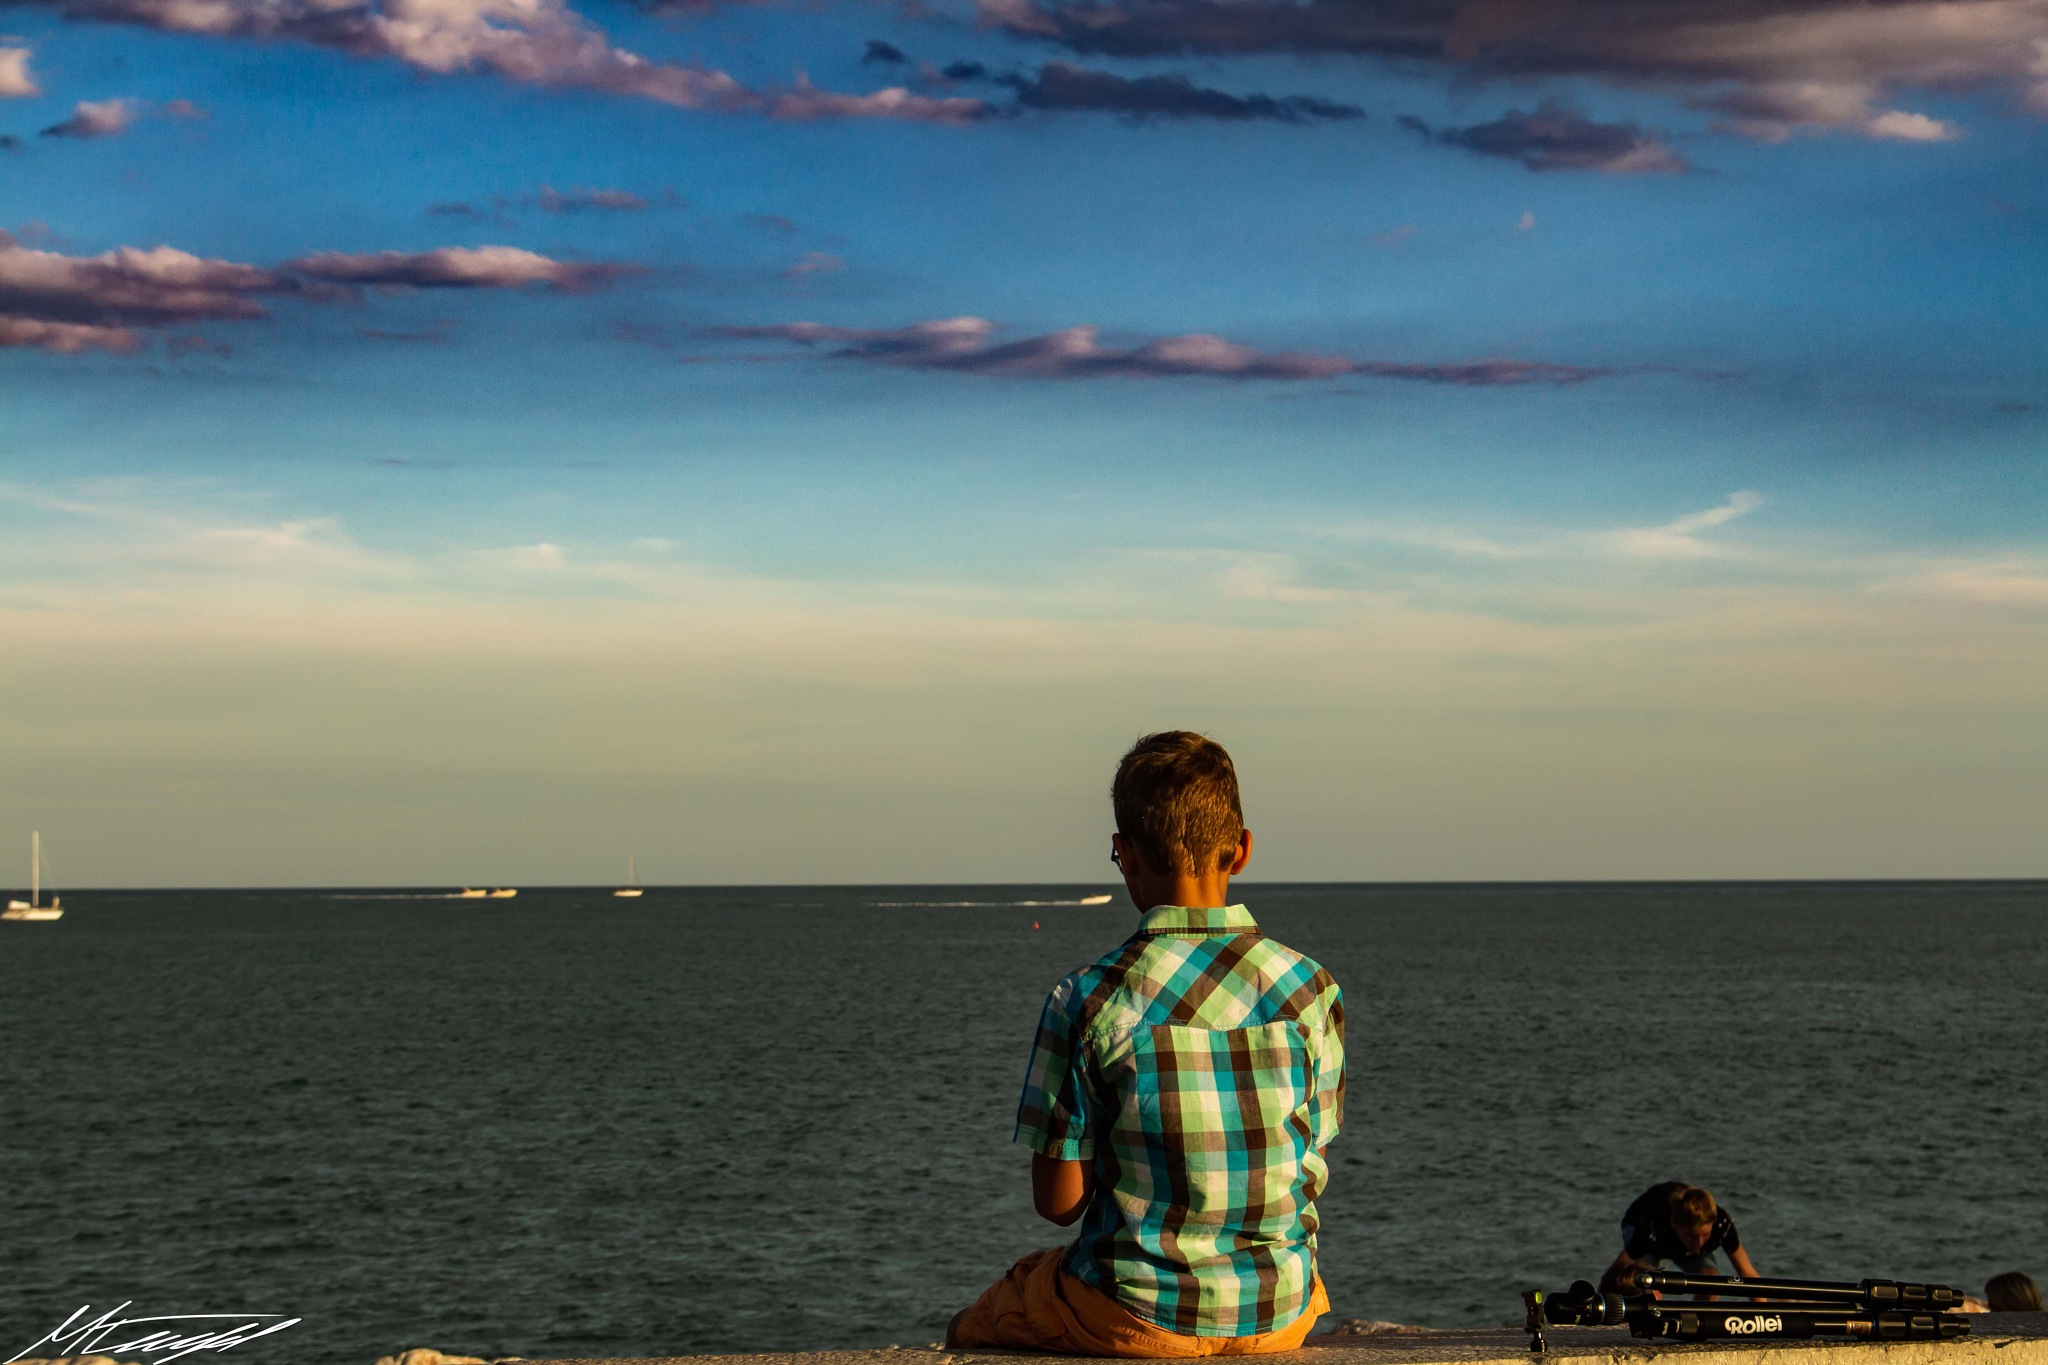 amazing coast view  by Marius Teufel